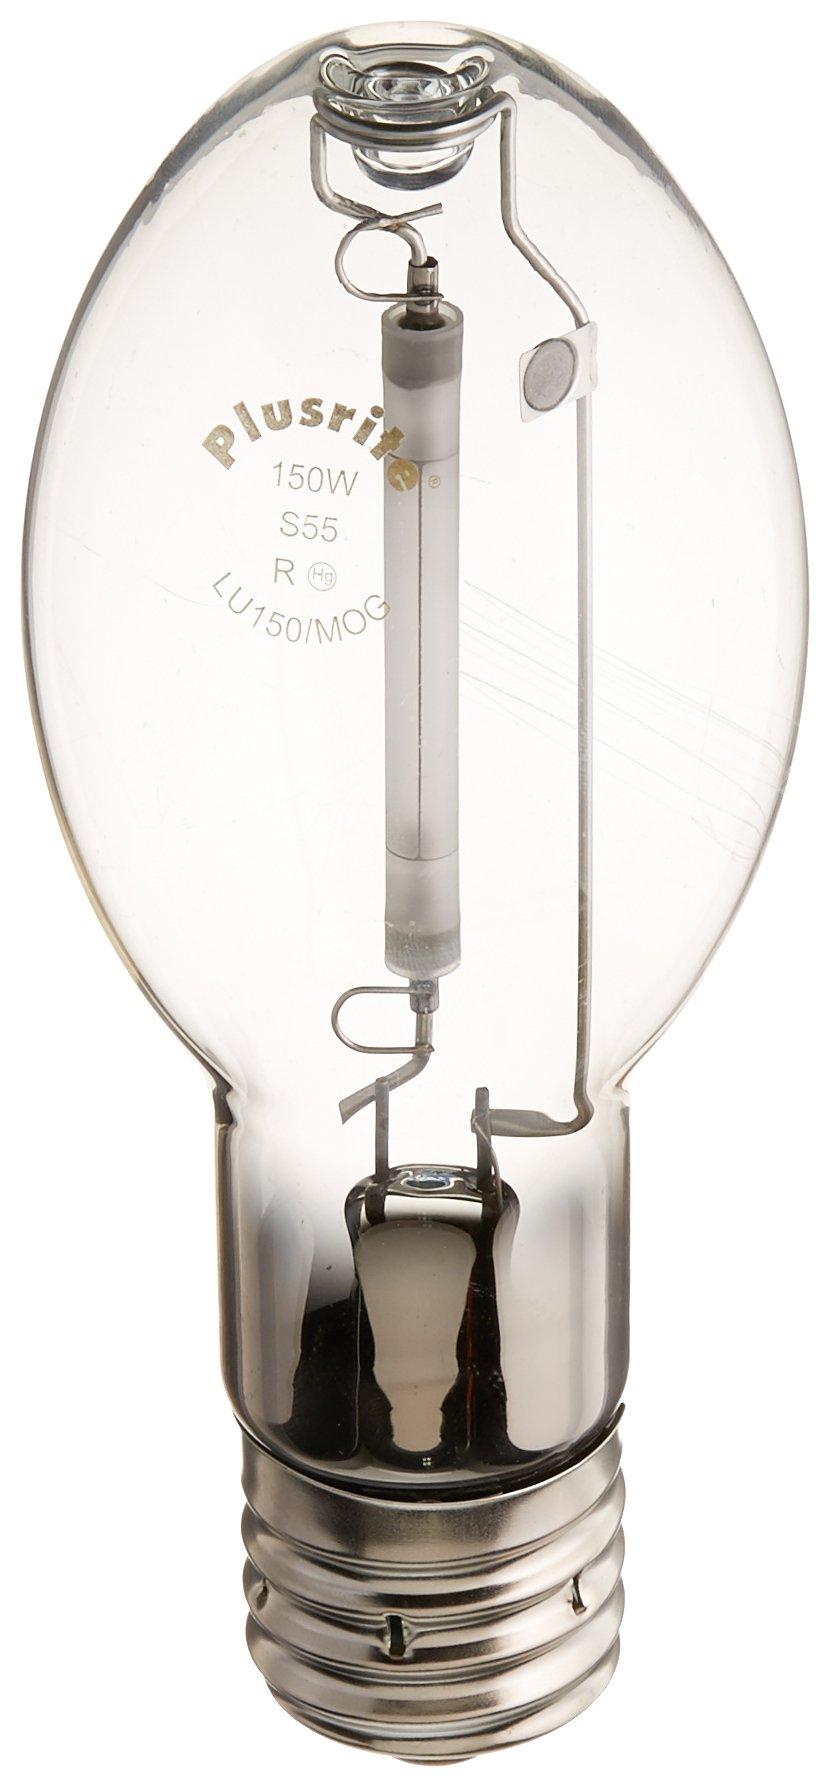 Plusrite 2007 - LU150 - Hps - 150 Watt - High Pressure Sodium - Mogul Base - Ansi S55,